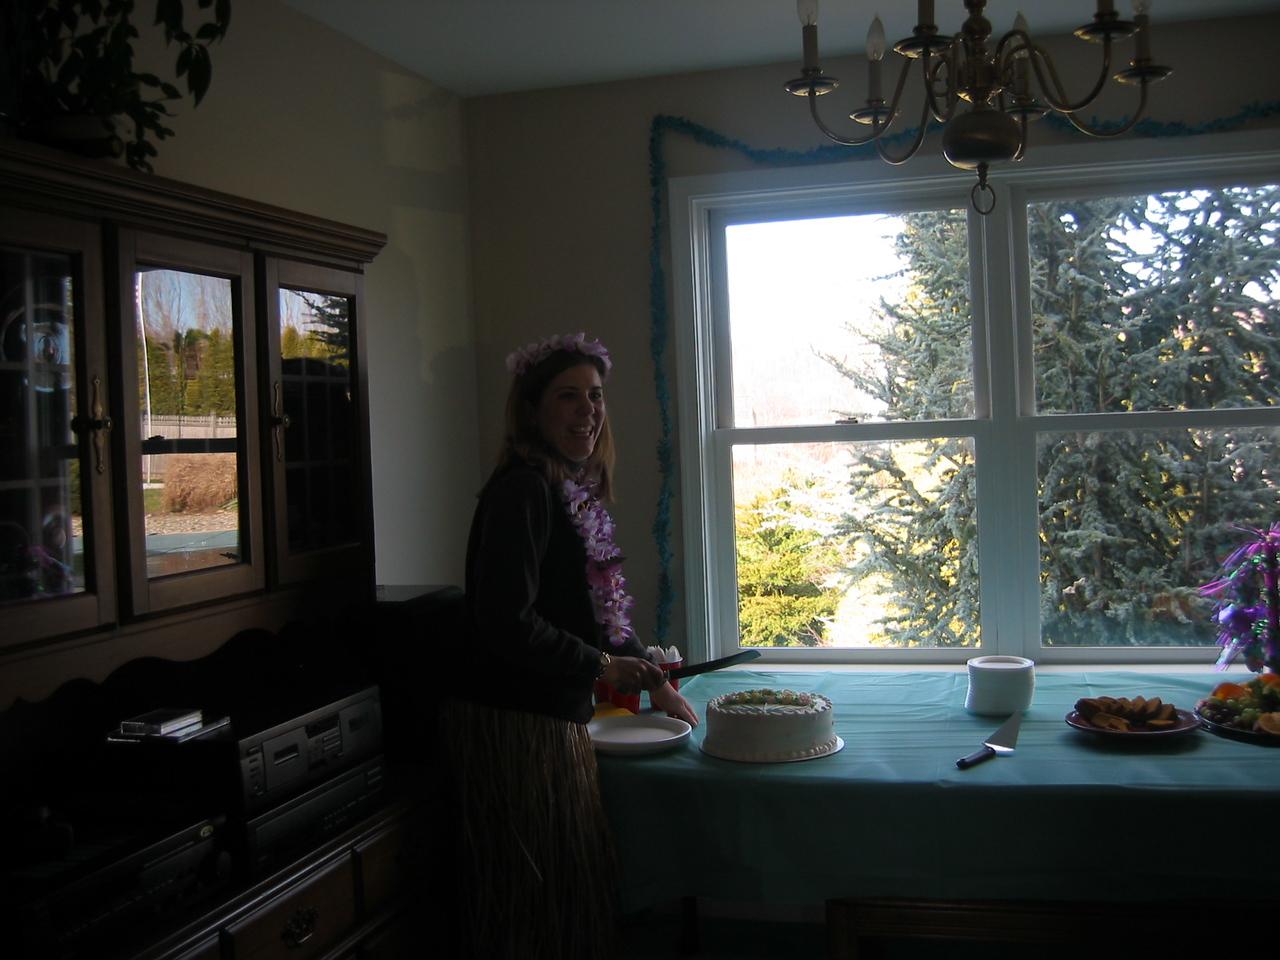 Ilsa cutting the cake